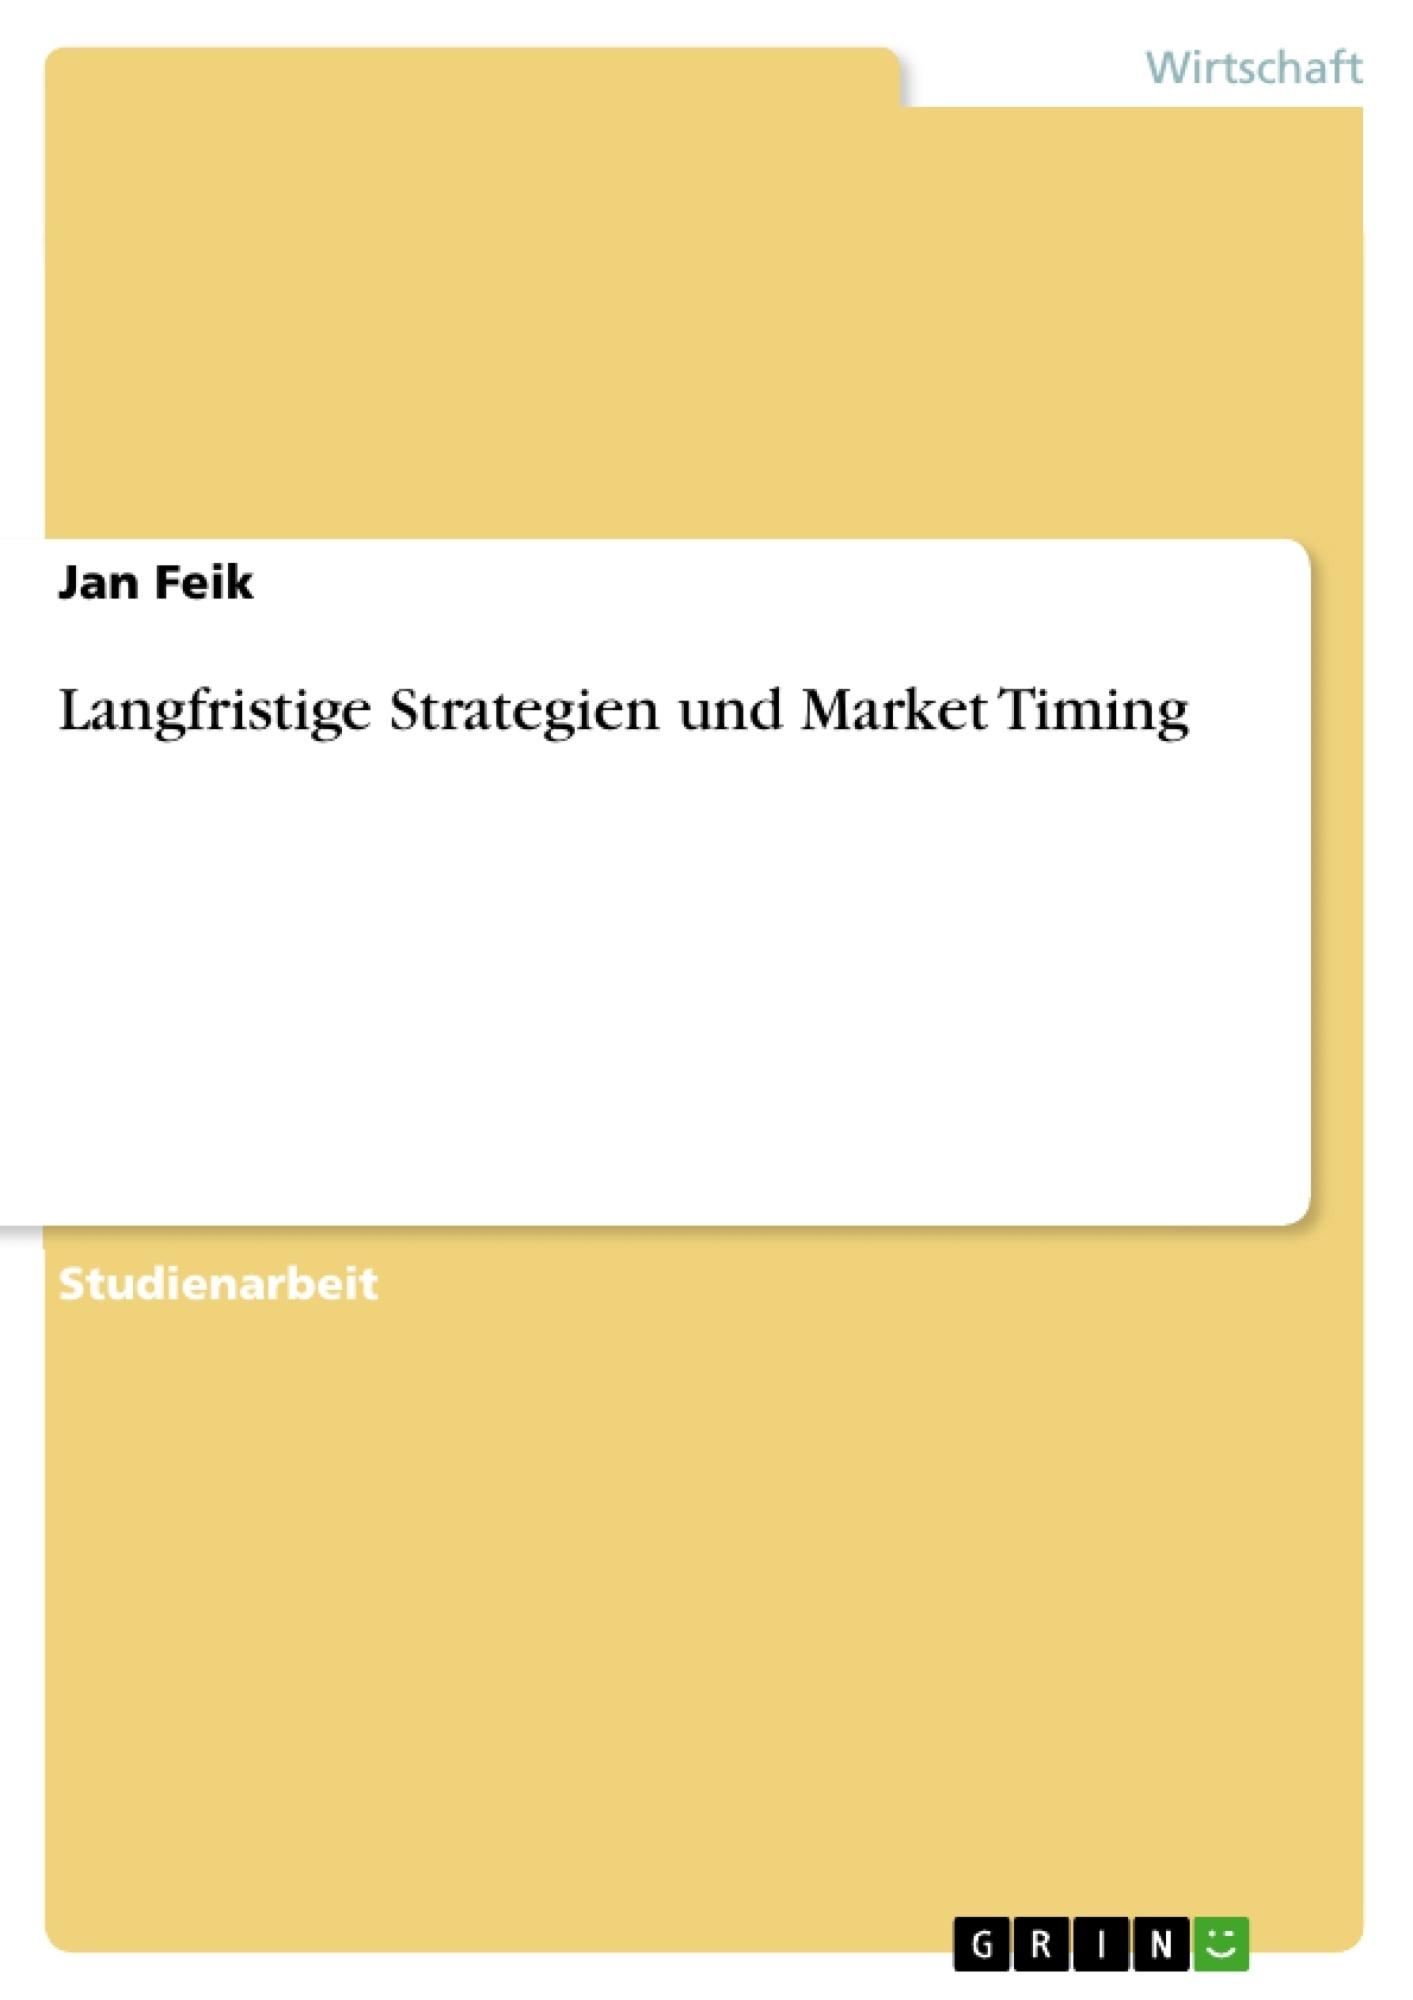 Titel: Langfristige Strategien und Market Timing